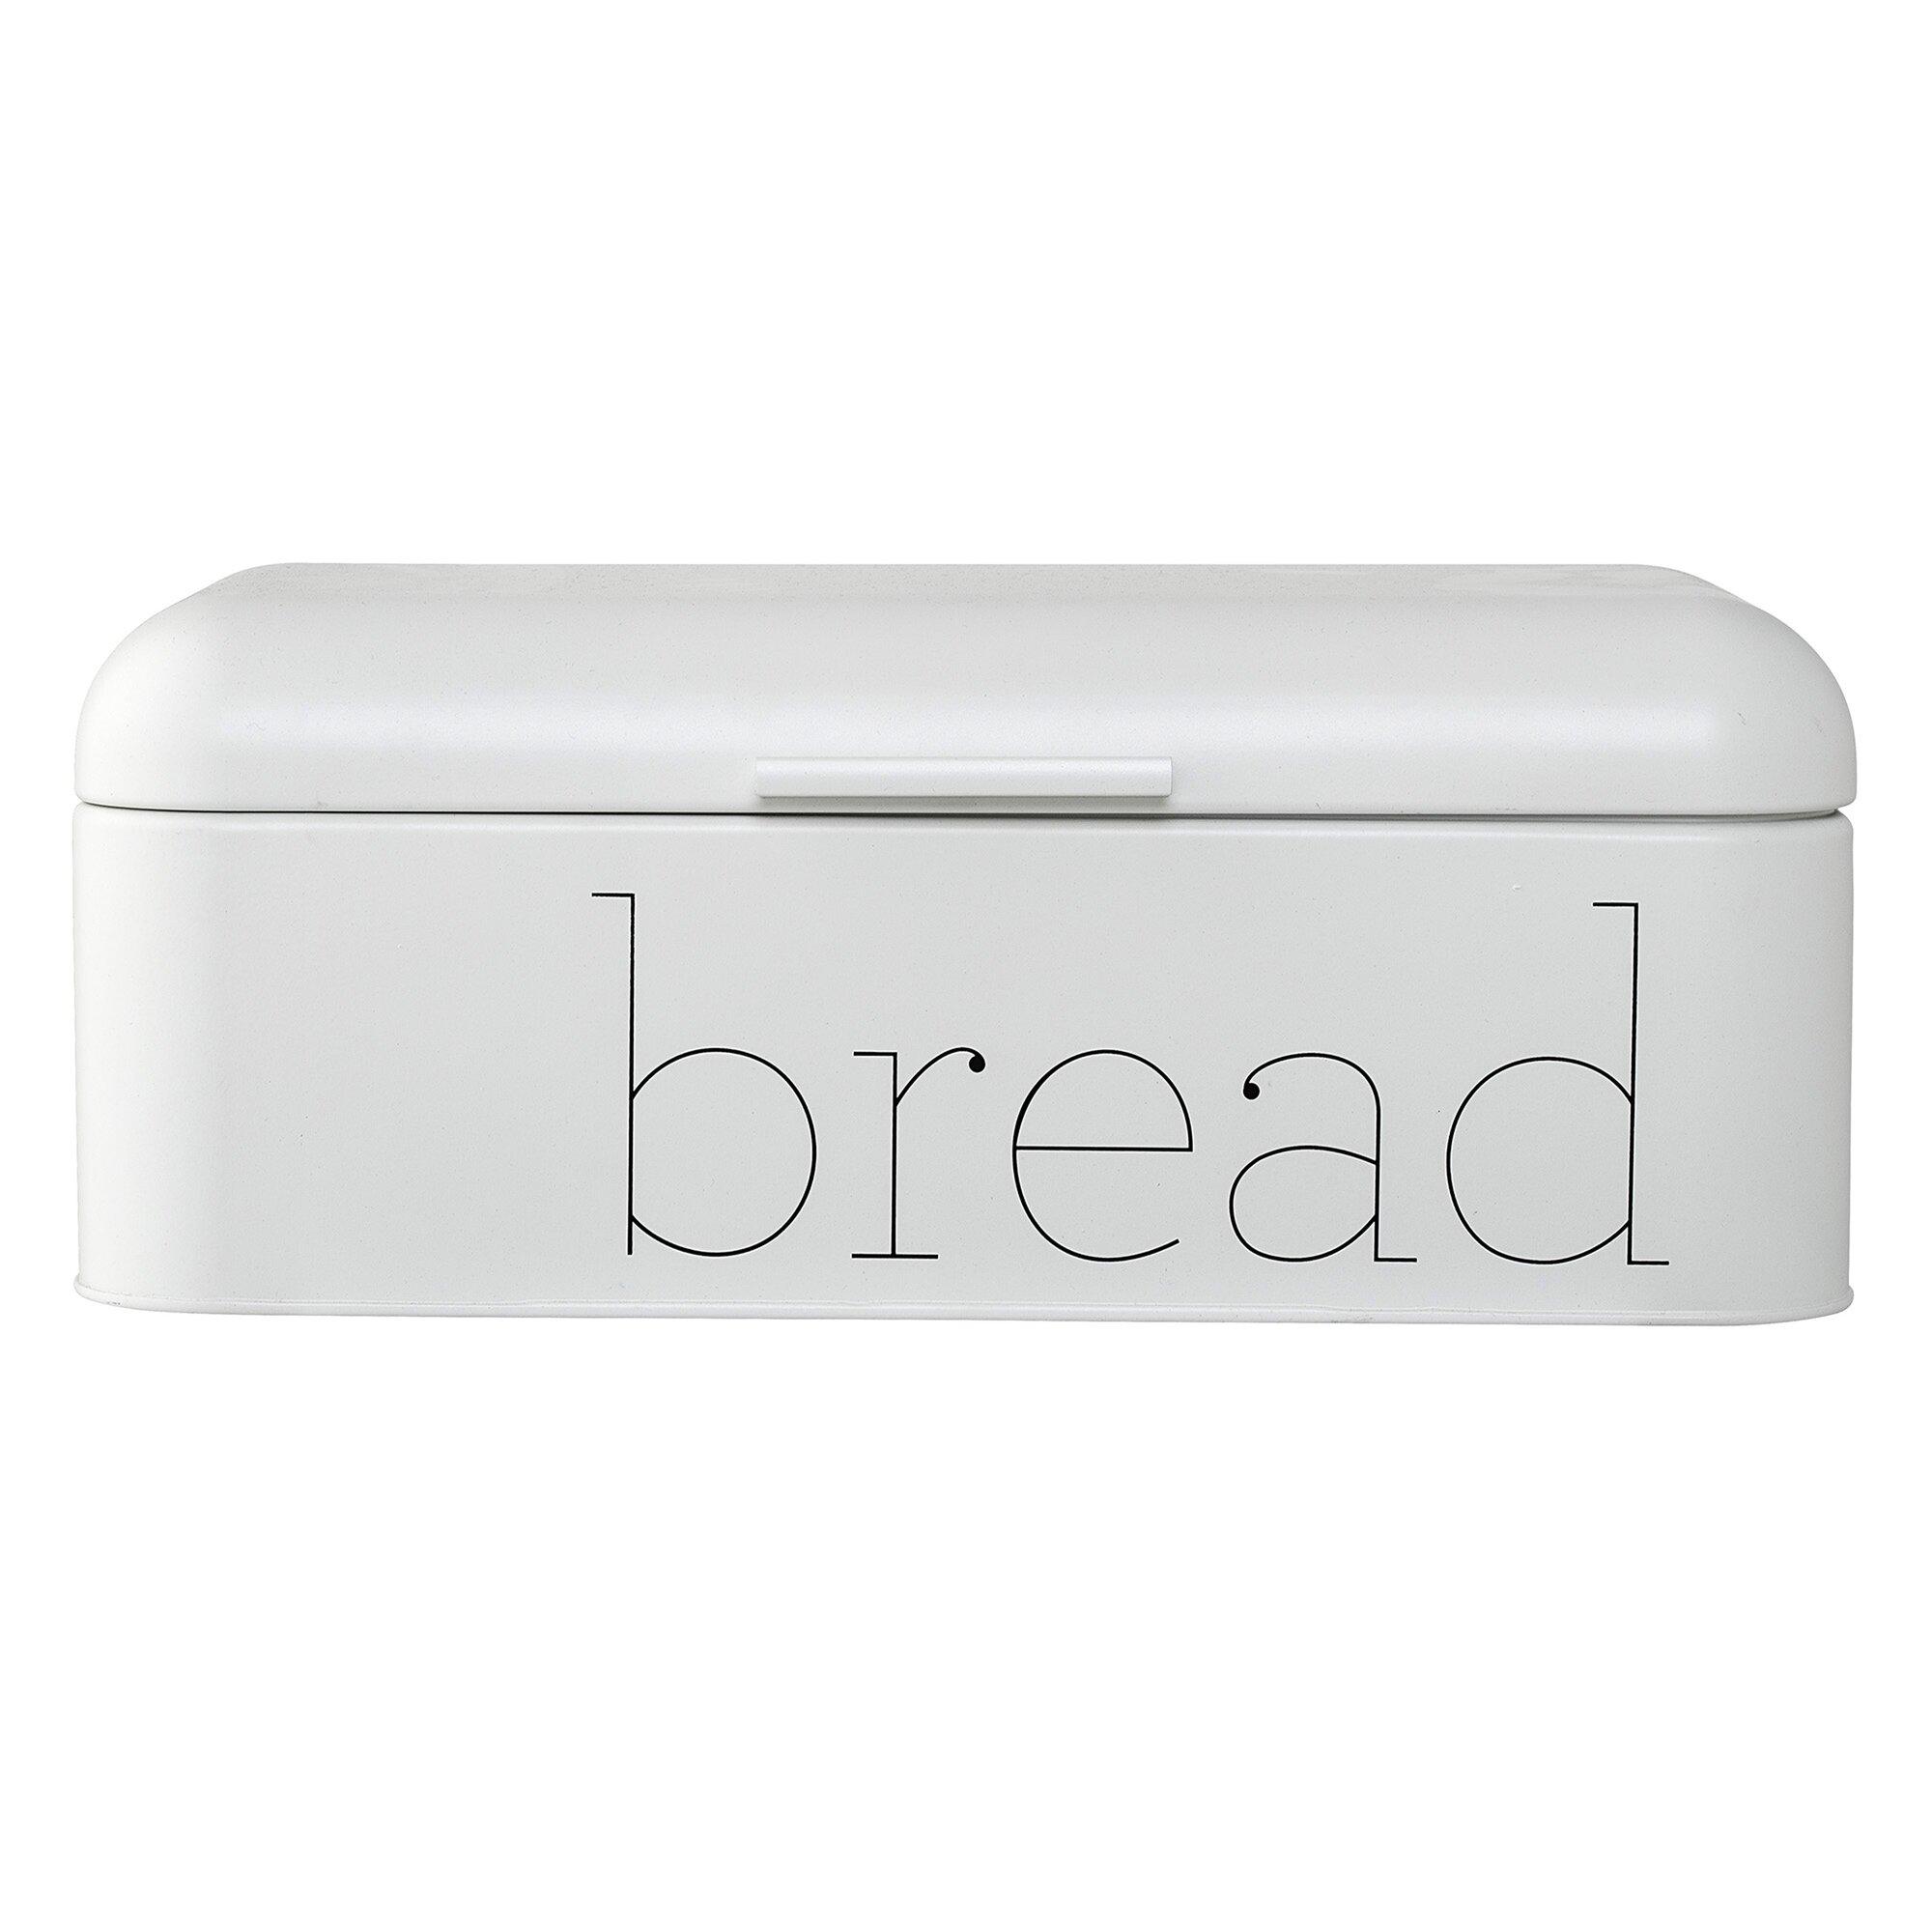 Tin bread box drawer insert - Get Plastic Drawer Anizer Aliexpress Stainless Steel Bread Box